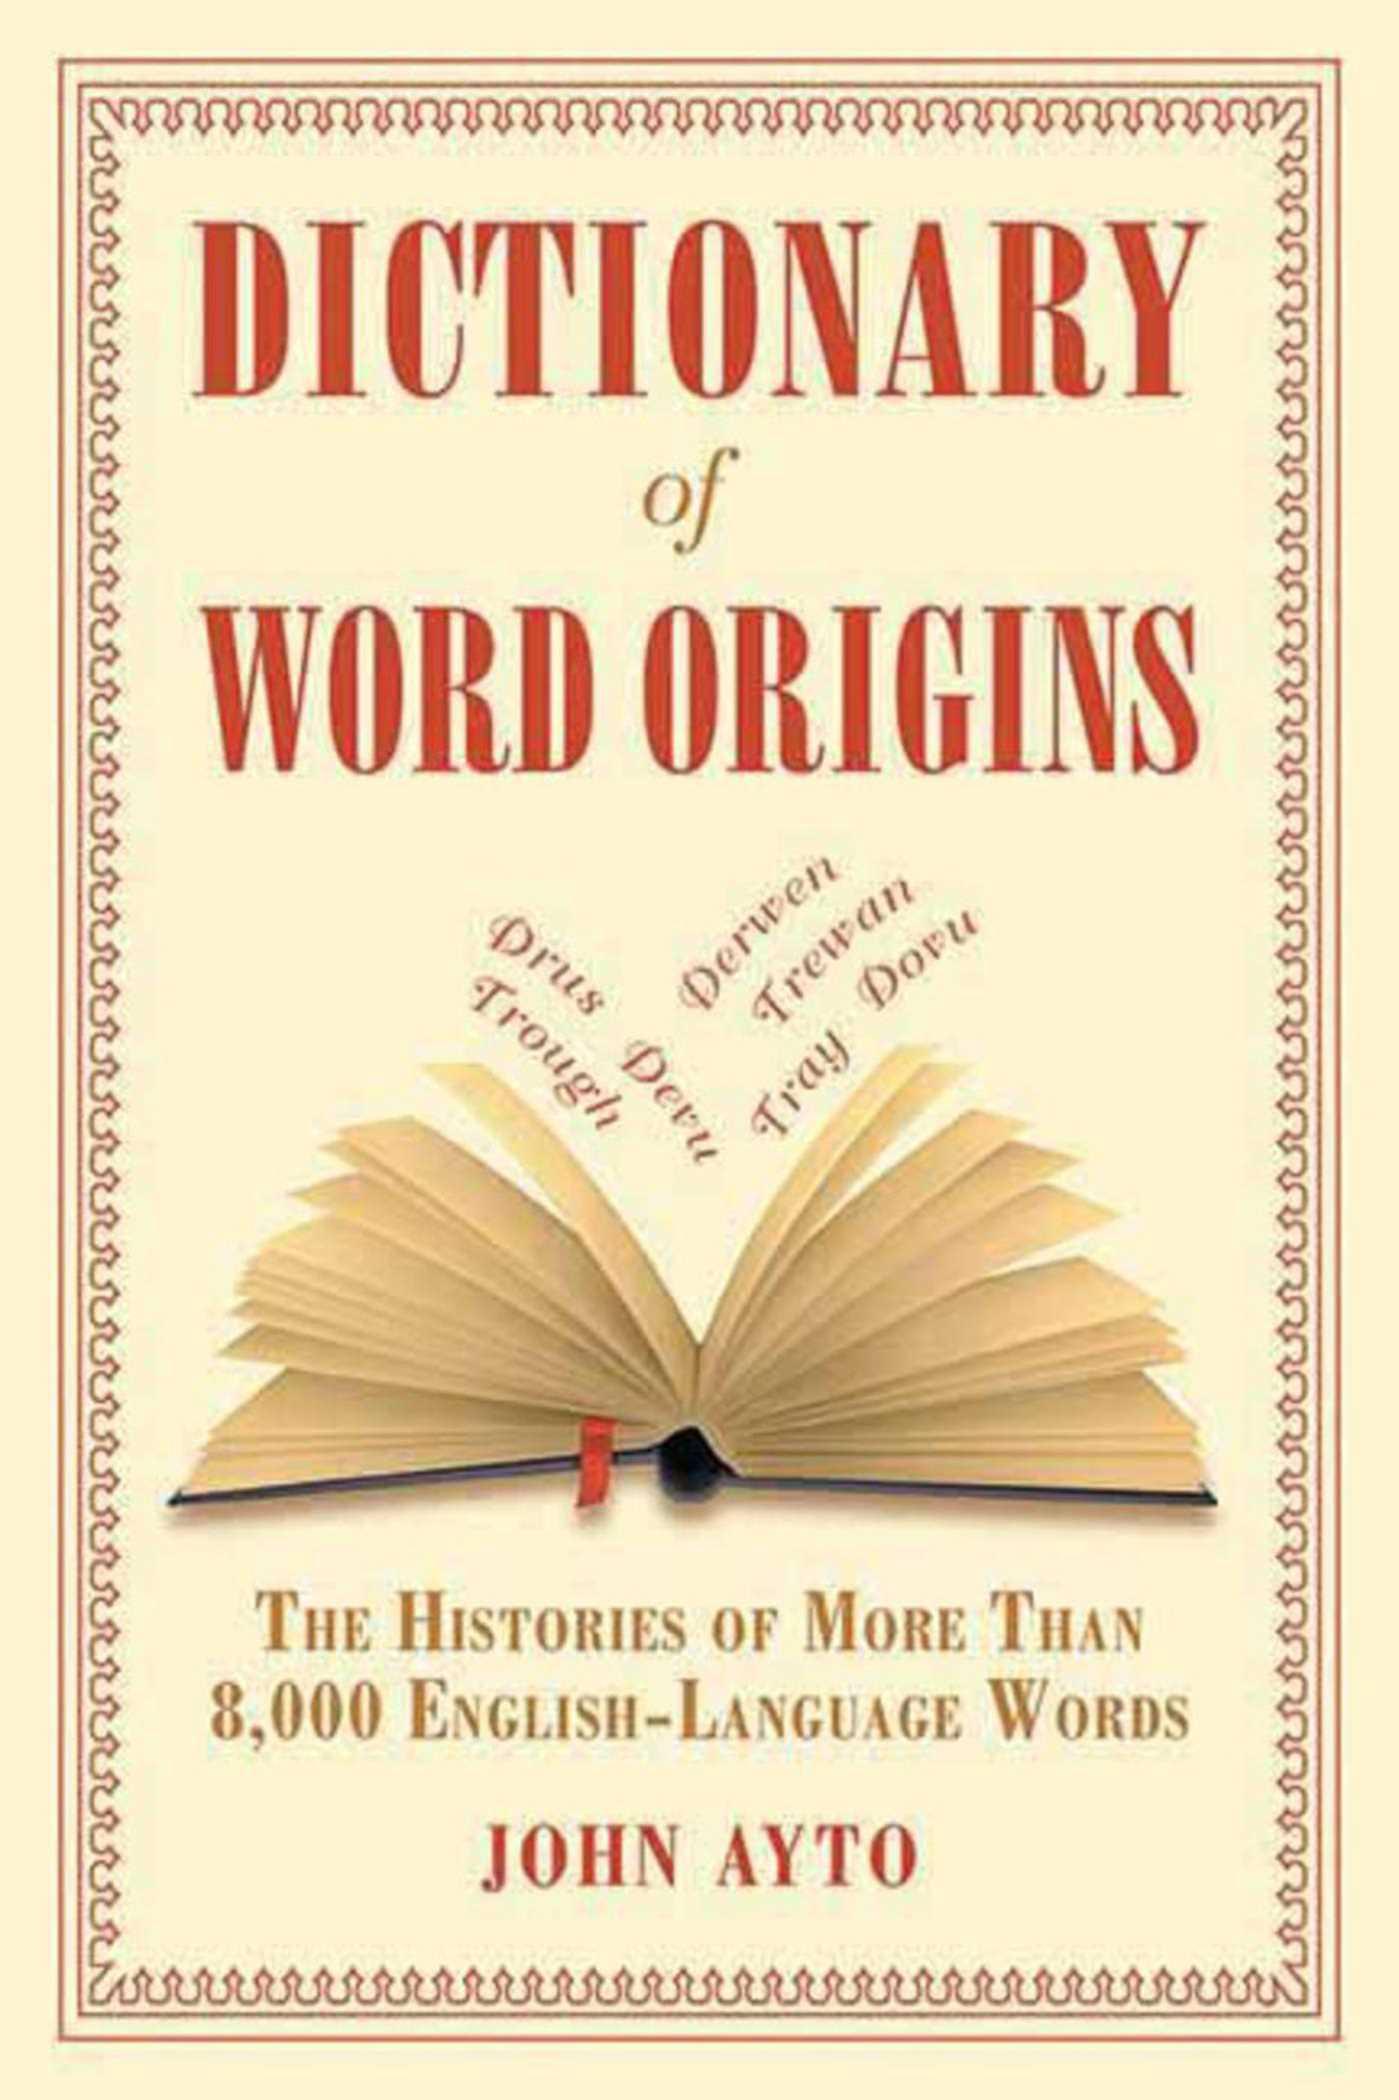 Book Cover Image (jpg): Dictionary of Word Origins